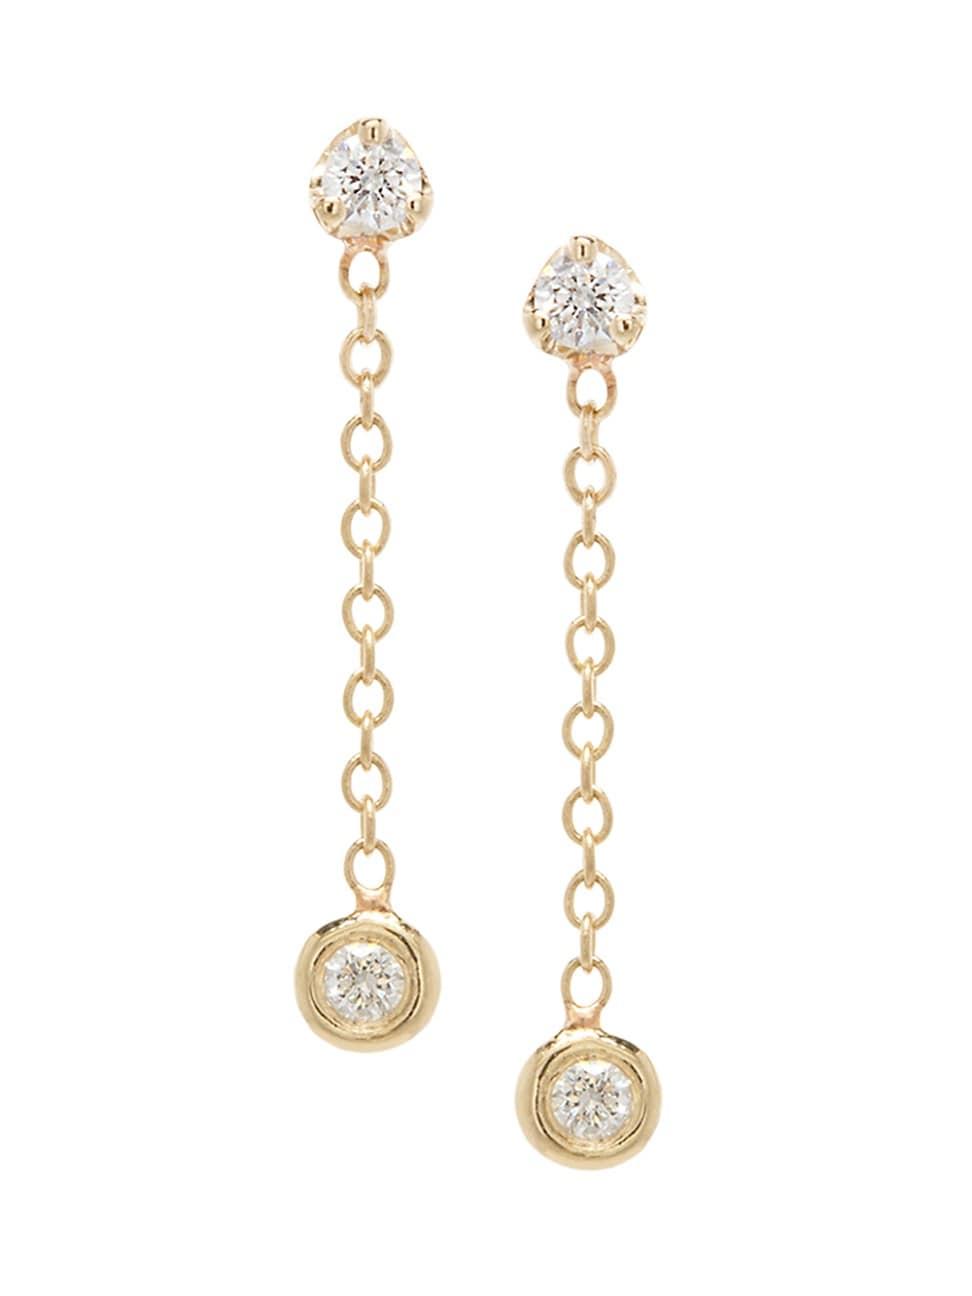 Zoë Chicco Women's 14k Yellow Gold & Diamond Small Chain Drop Earrings